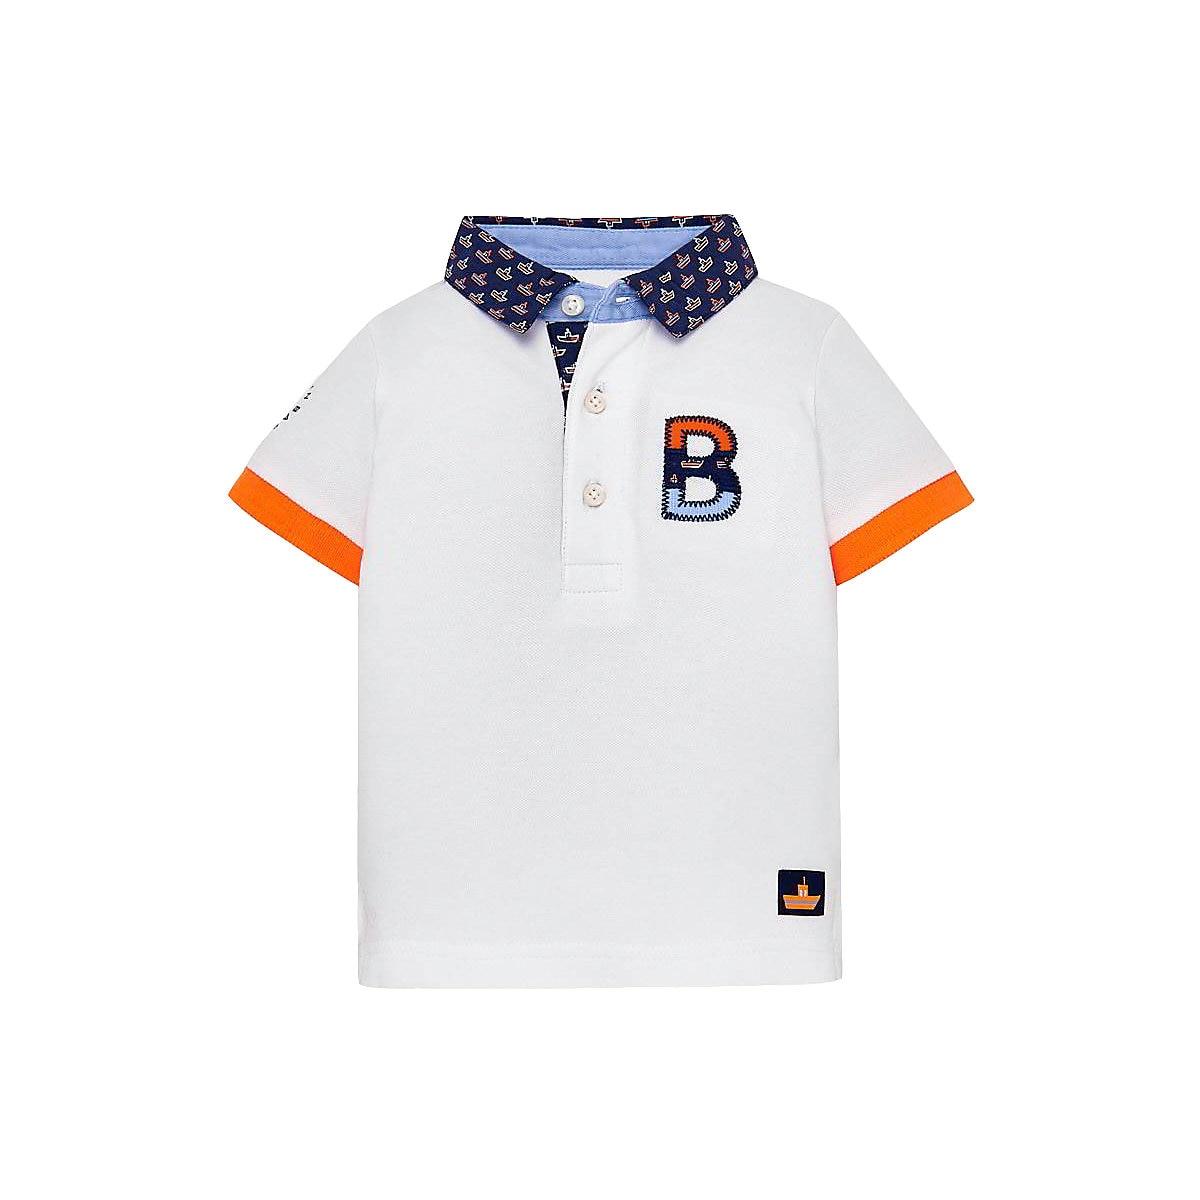 MAYORAL Polo Shirts 10681446 Children Clothing T-shirt Shirt The Print For Boys